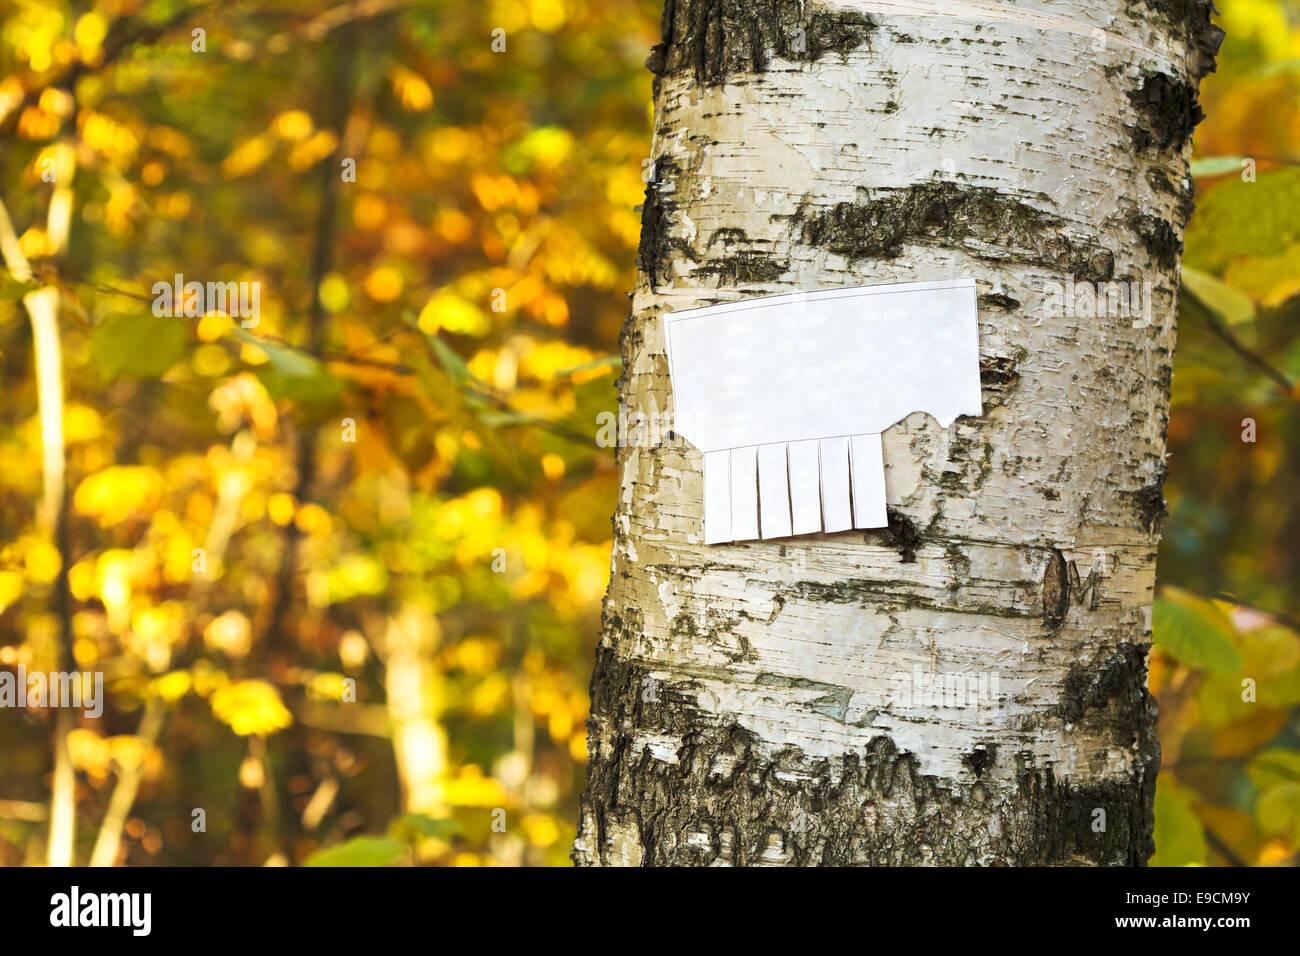 tear-off paper notice on birch trunk in autumn urban park - Stock Image